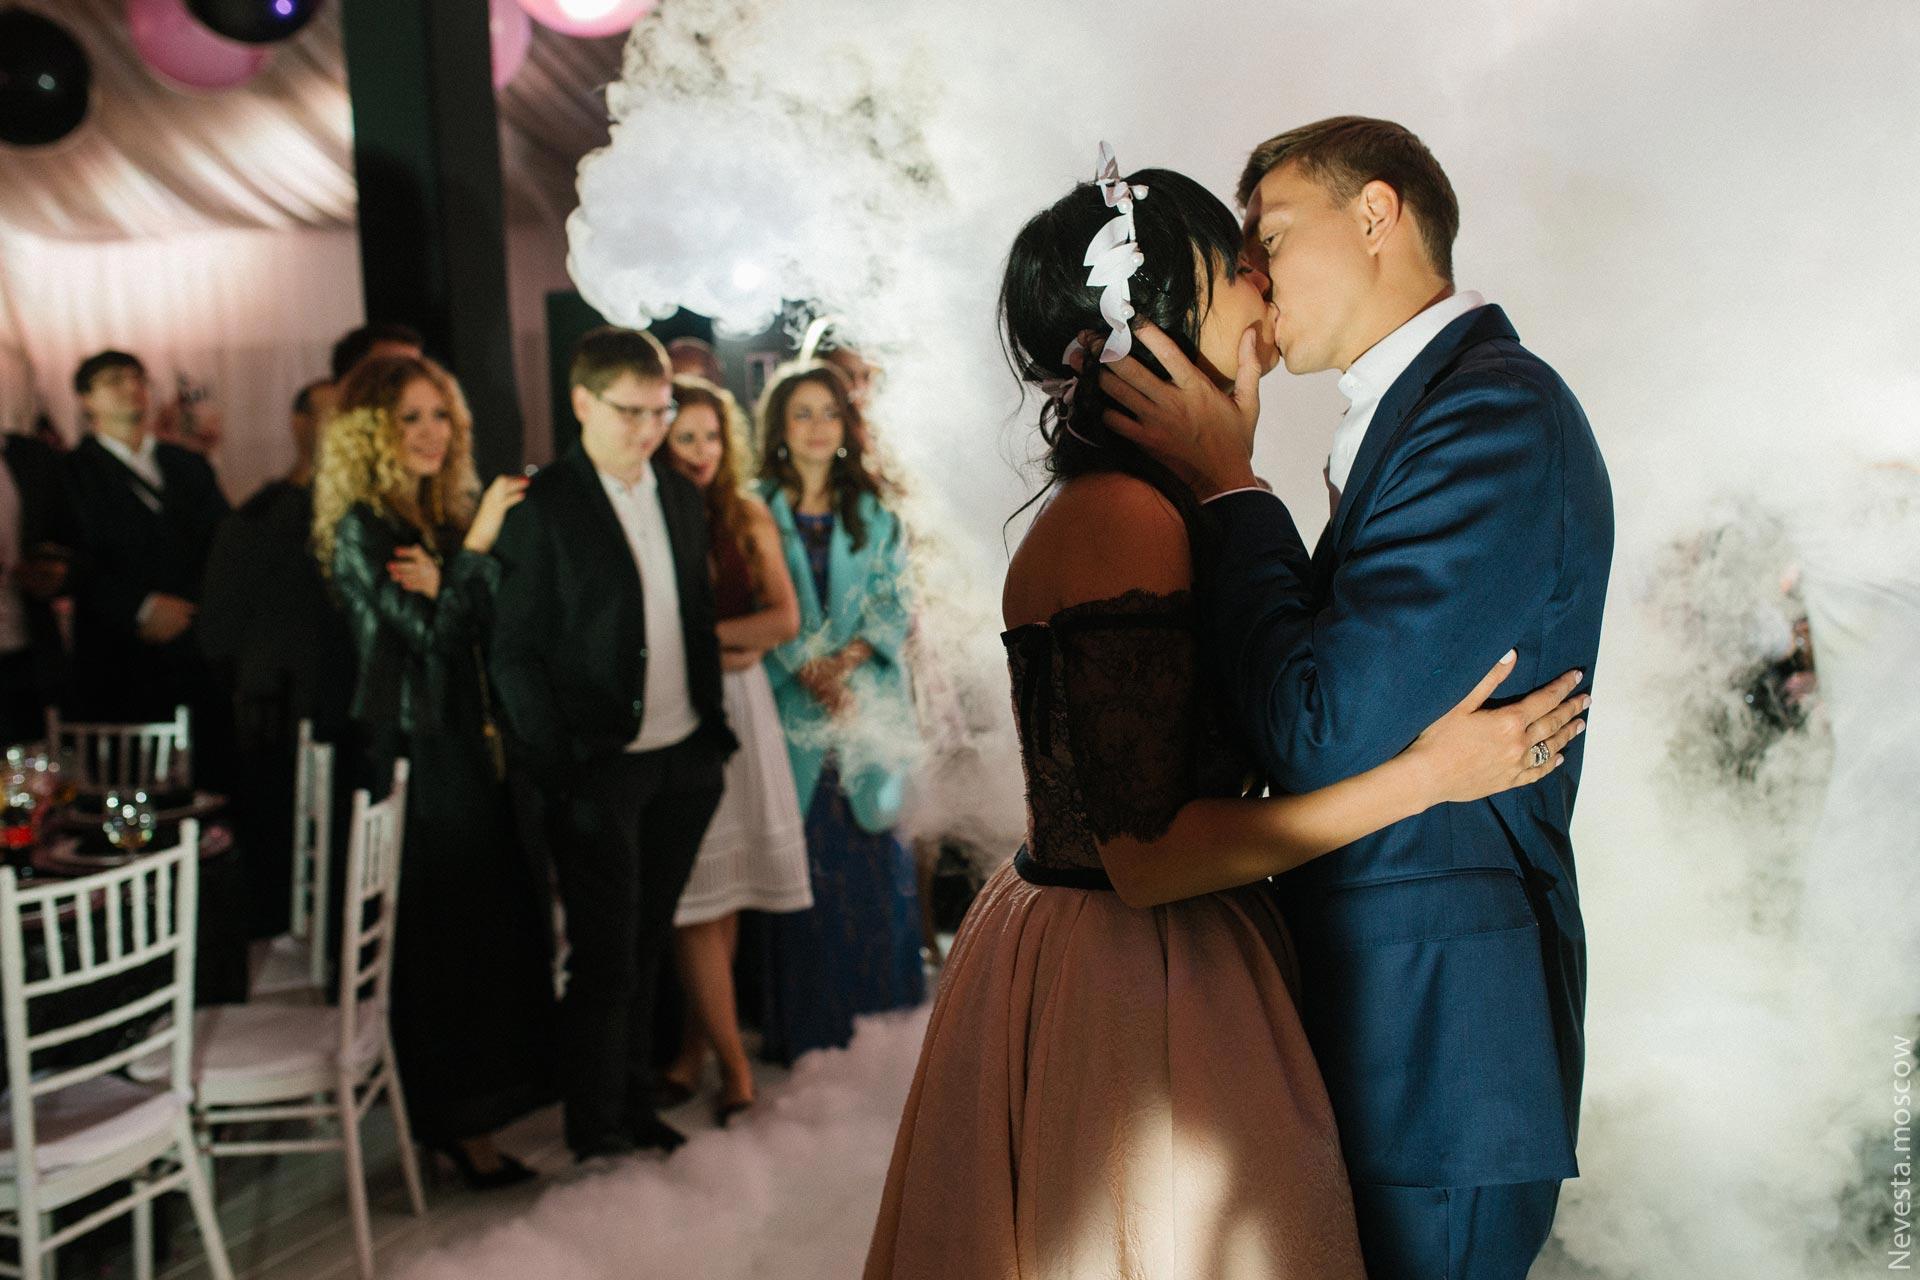 Свадьба Нелли Ермолаевой и Кирилла Андреева фото 17